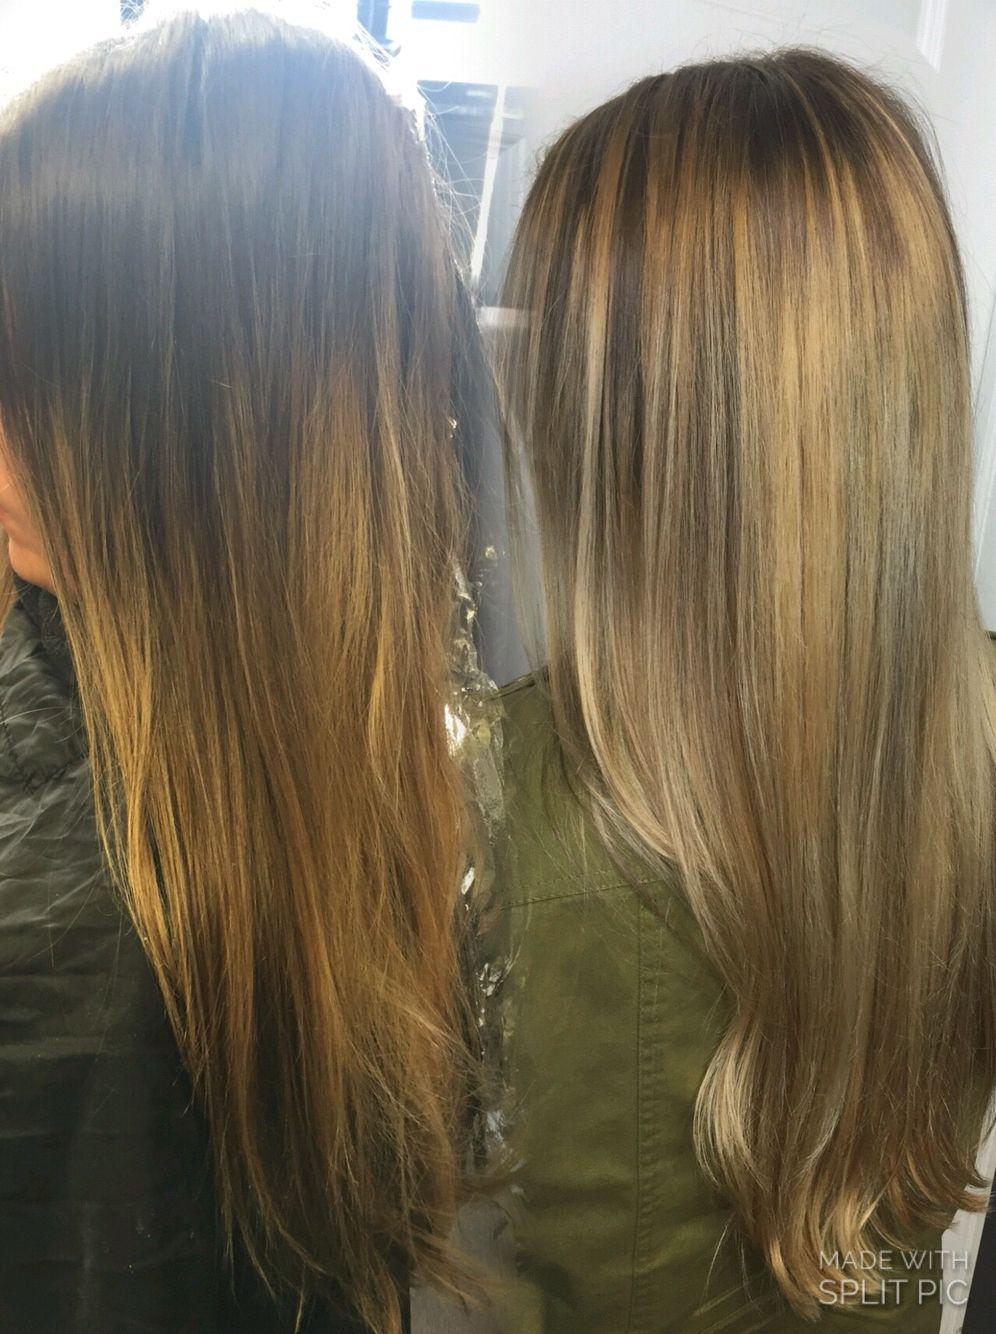 #hairbynikkix #dirosa #goldwellus #color #instahair #hair #hairbrained #hairdressermagic #modernsalon #bangstyle #btcpics #behindthechair #thecoloristmag #haircolor #iamlicensed #longisland #newyork #love #scissorsalute #angelofcolour #larisalovelook #iamgoldwell #bestoflongisland #hairinspo #industriebeauty #breezyslist